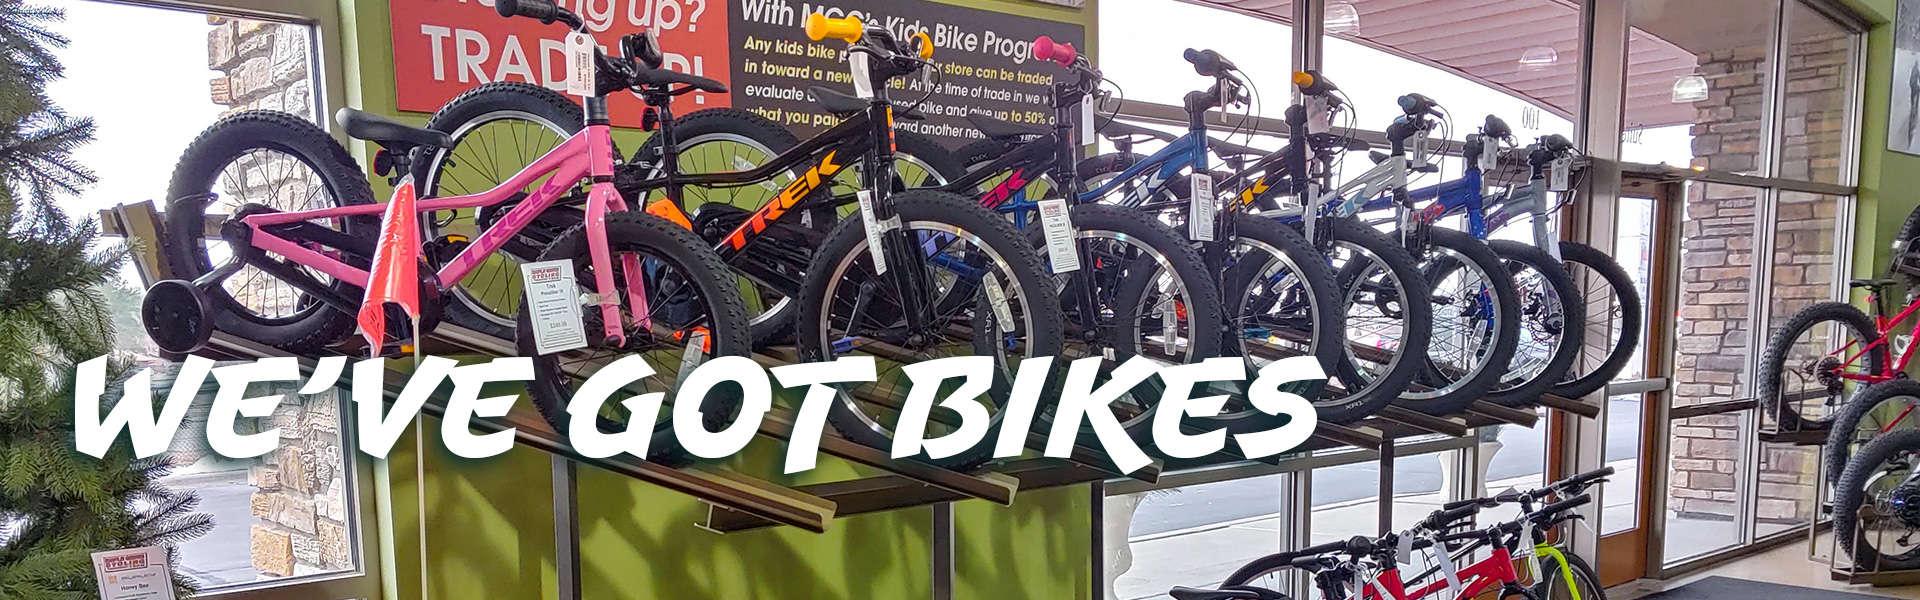 We've Got Kid's Bikes